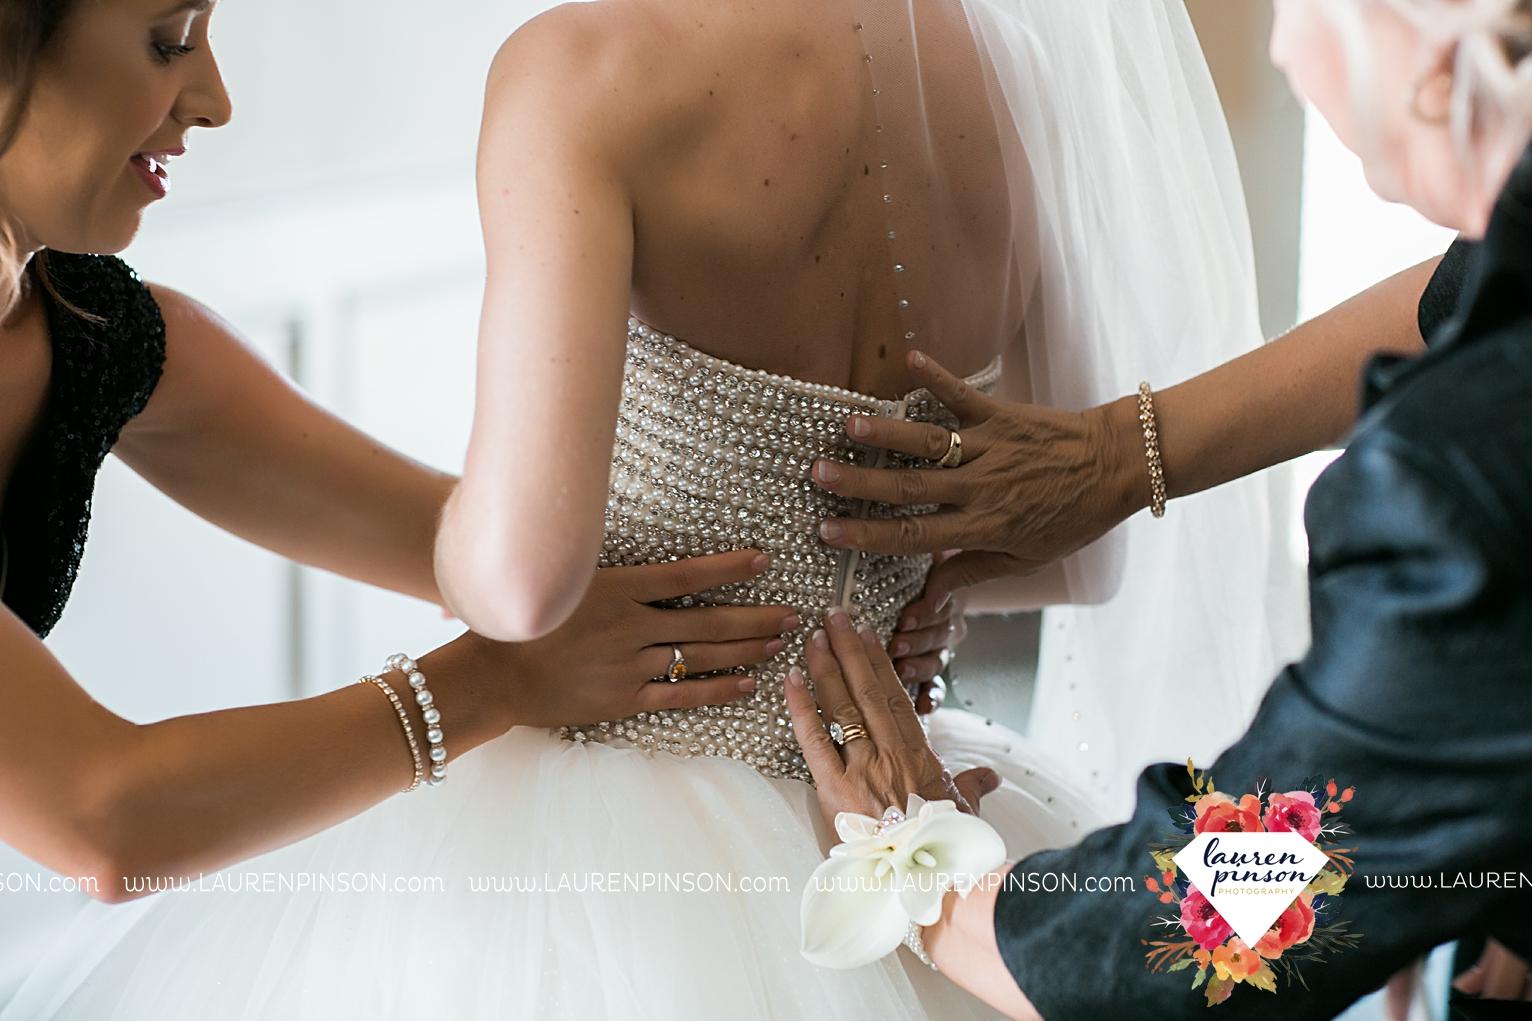 wichita-falls-texas-wedding-photographer-the-forum-by-the-kemp-mayfield-events-ulta-gold-glitter_2811.jpg